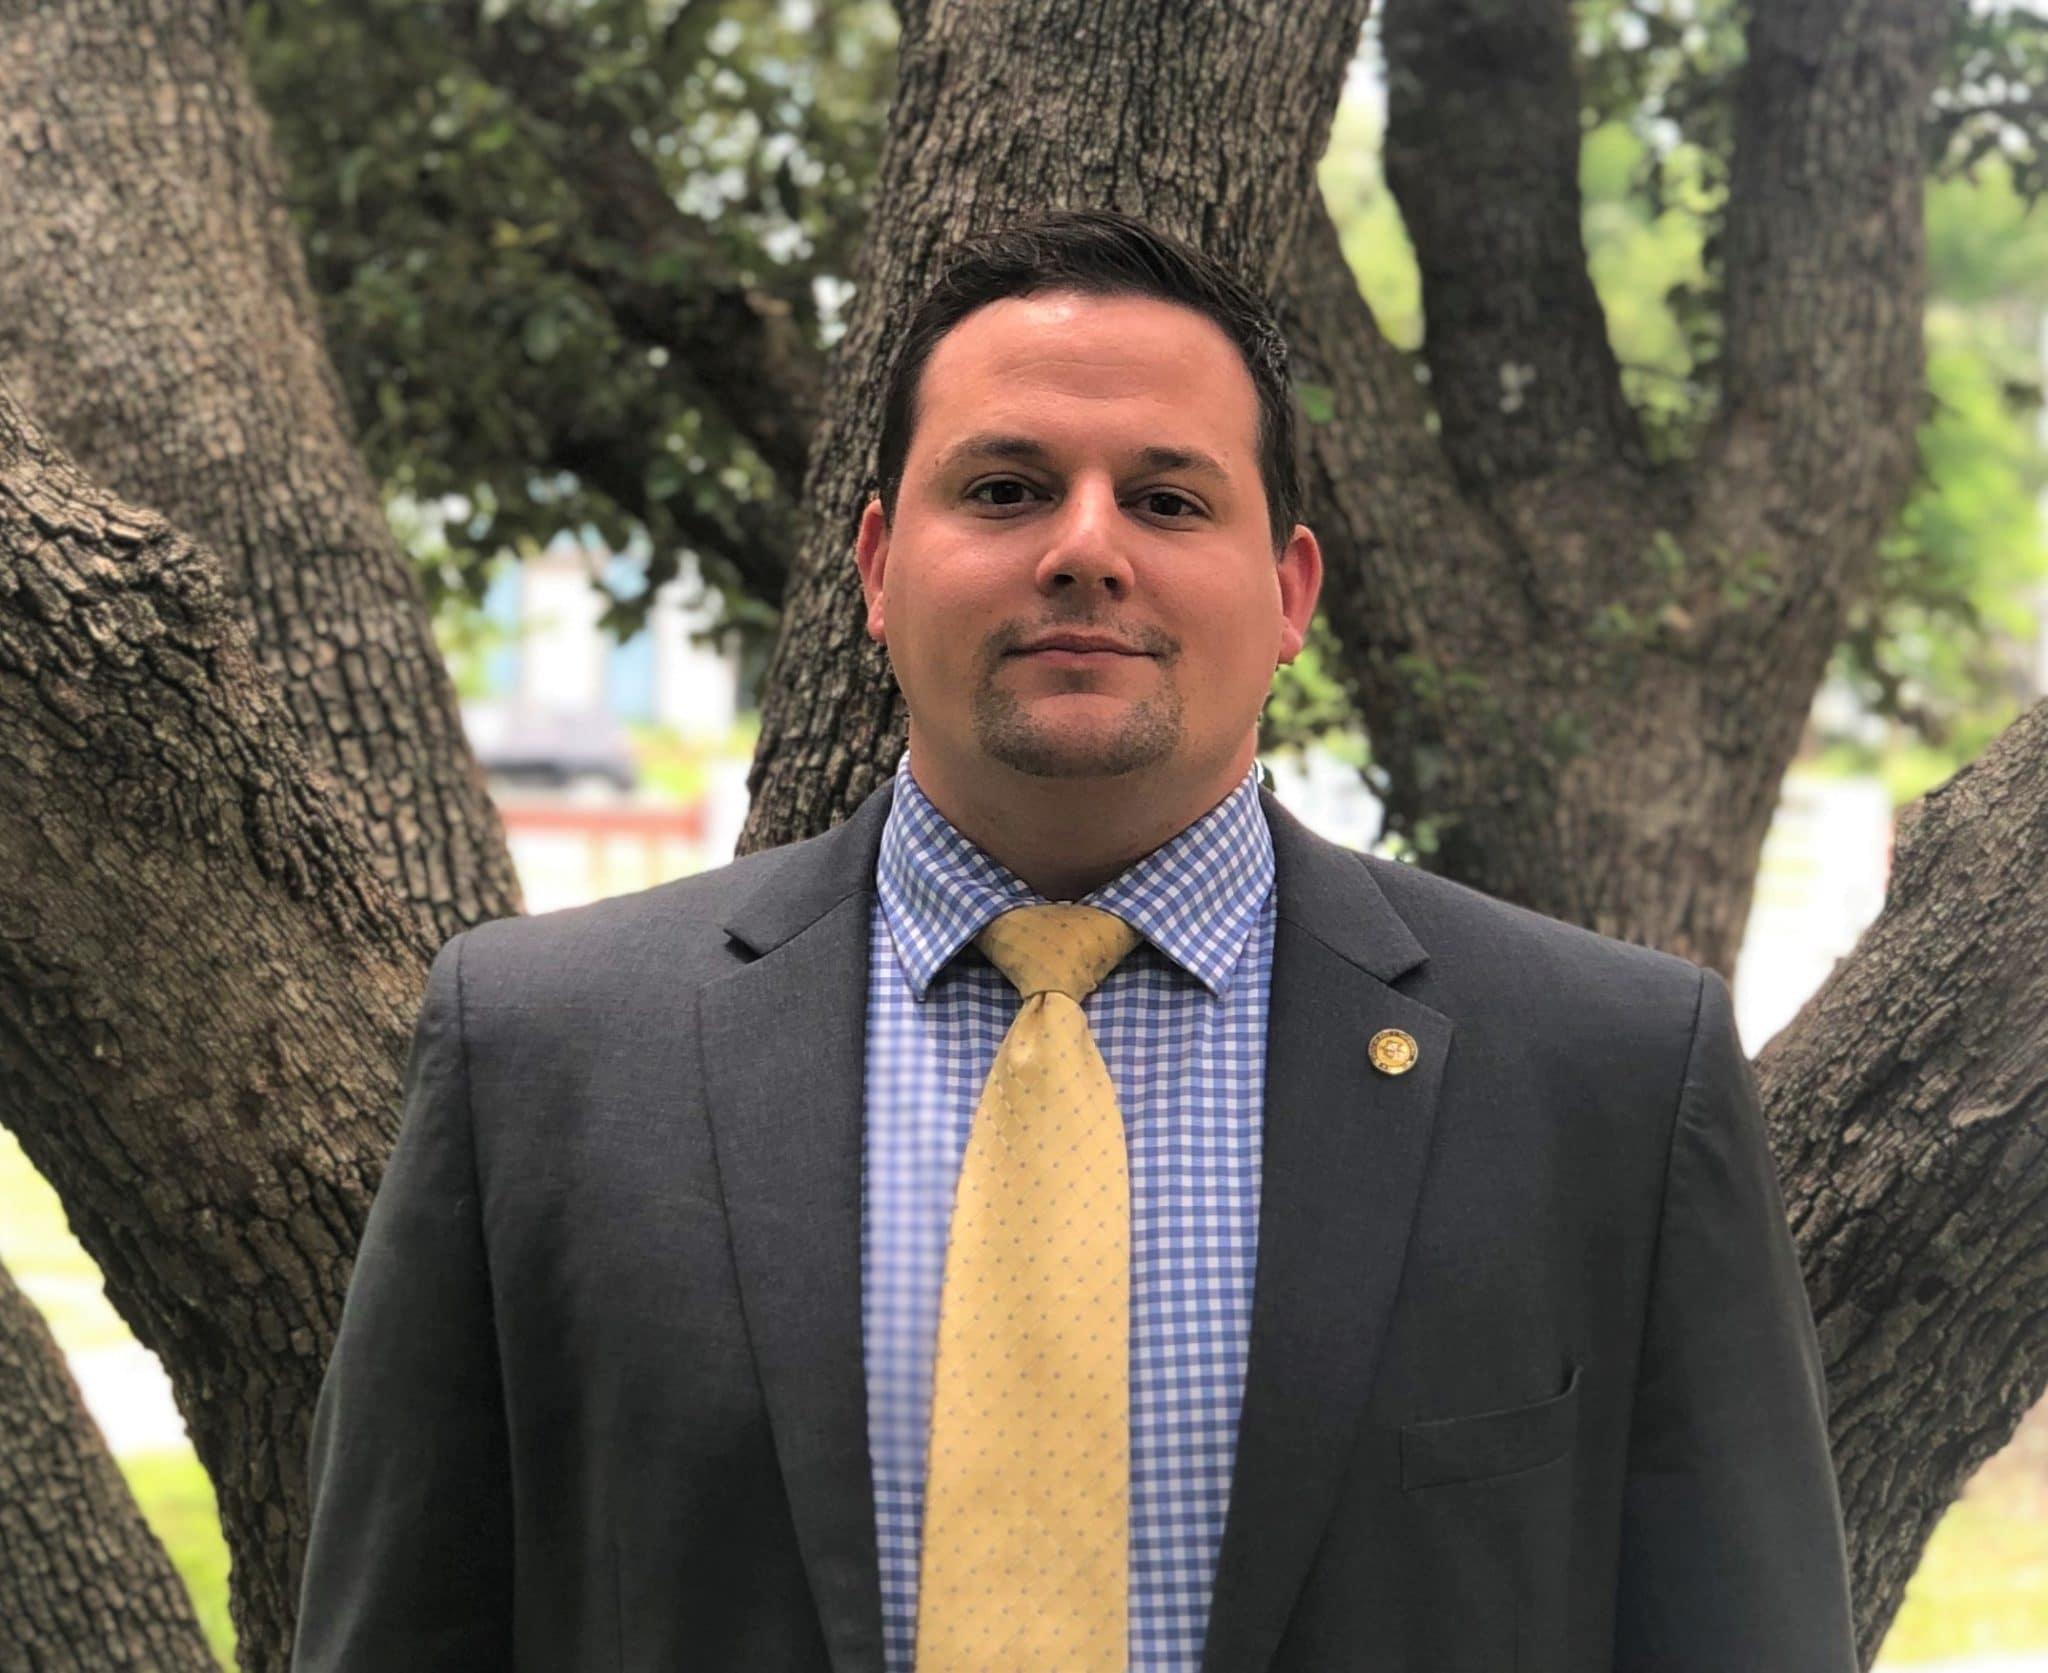 Greg Thoennes - Regional Vice President - Austin, Texas, Arizona, New Mexico and Utah